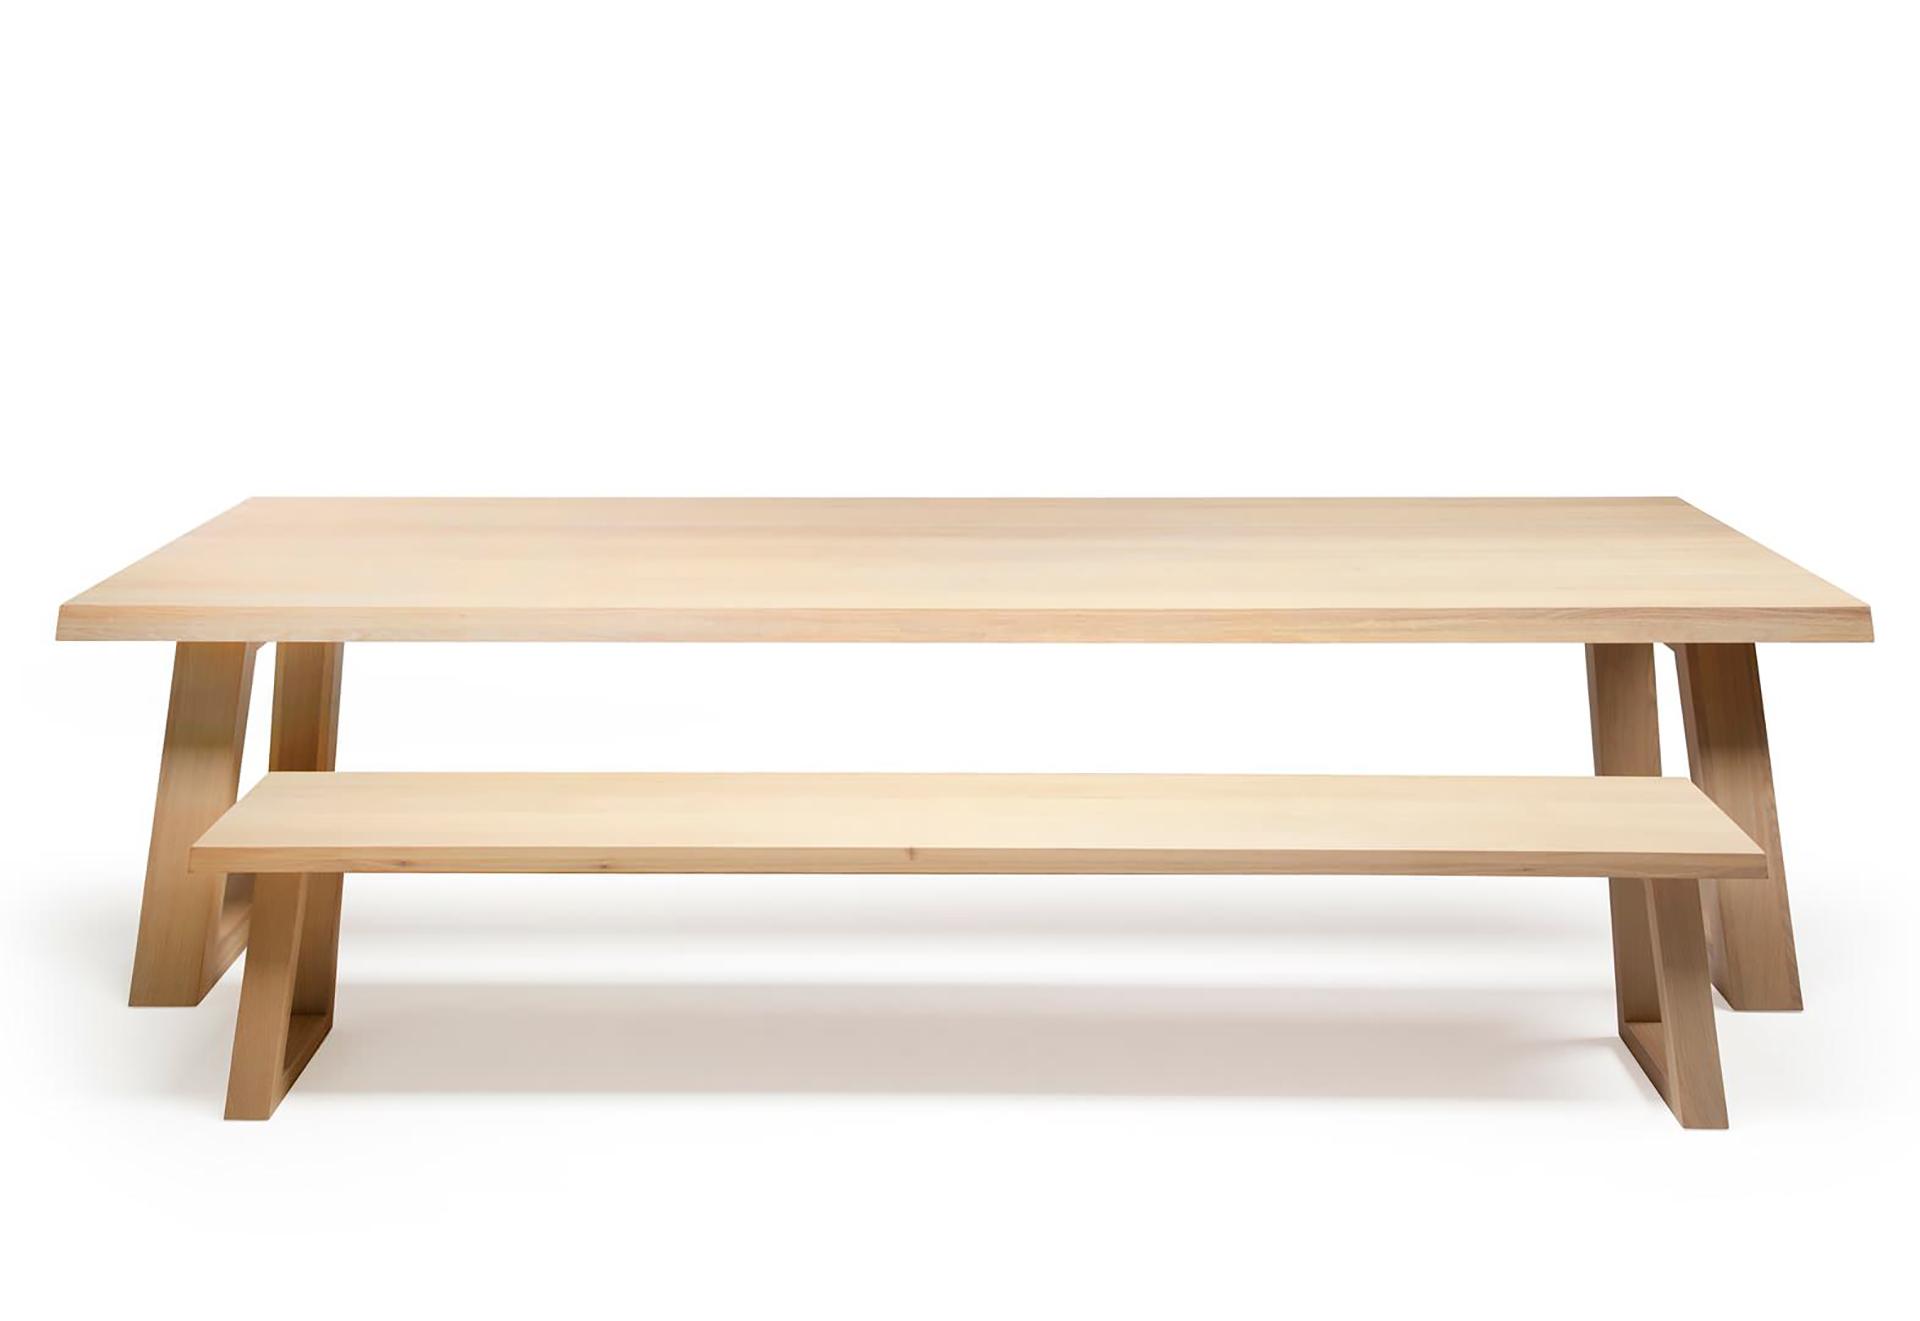 Eettafel Bank 240 Cm.Design Bank Slide L Remy Meijers L Odesi Your Dutch Design